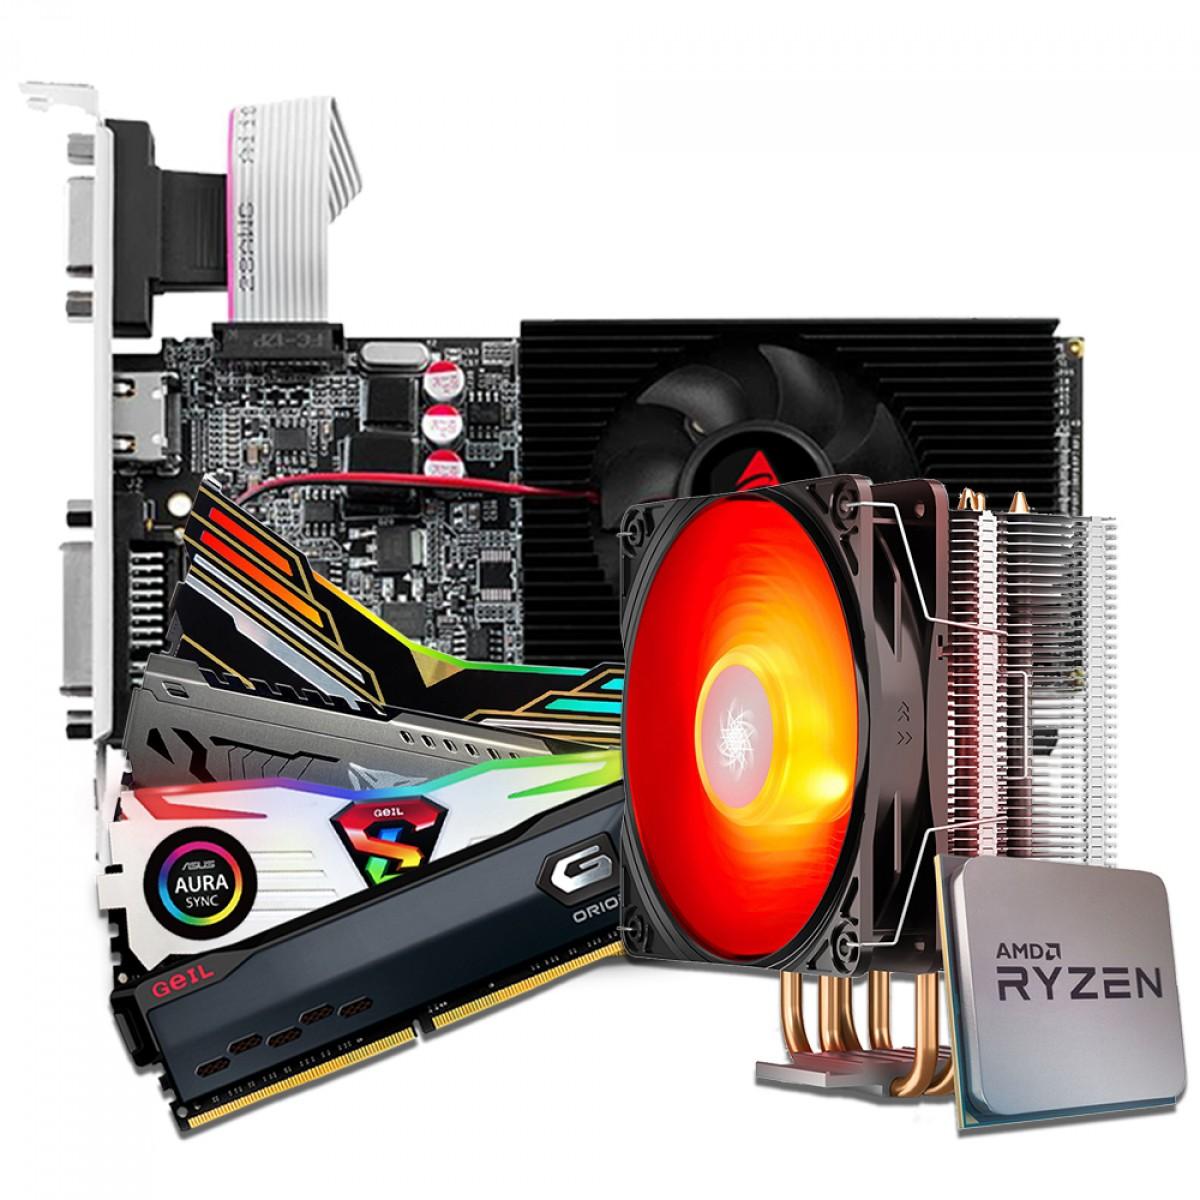 Kit Upgrade Biostar NVIDIA GeForce GT 710 + Ryzen 3 3300X +  Memória DDR4 16GB (2x8GB) 3000Mhz + Brinde Cooler